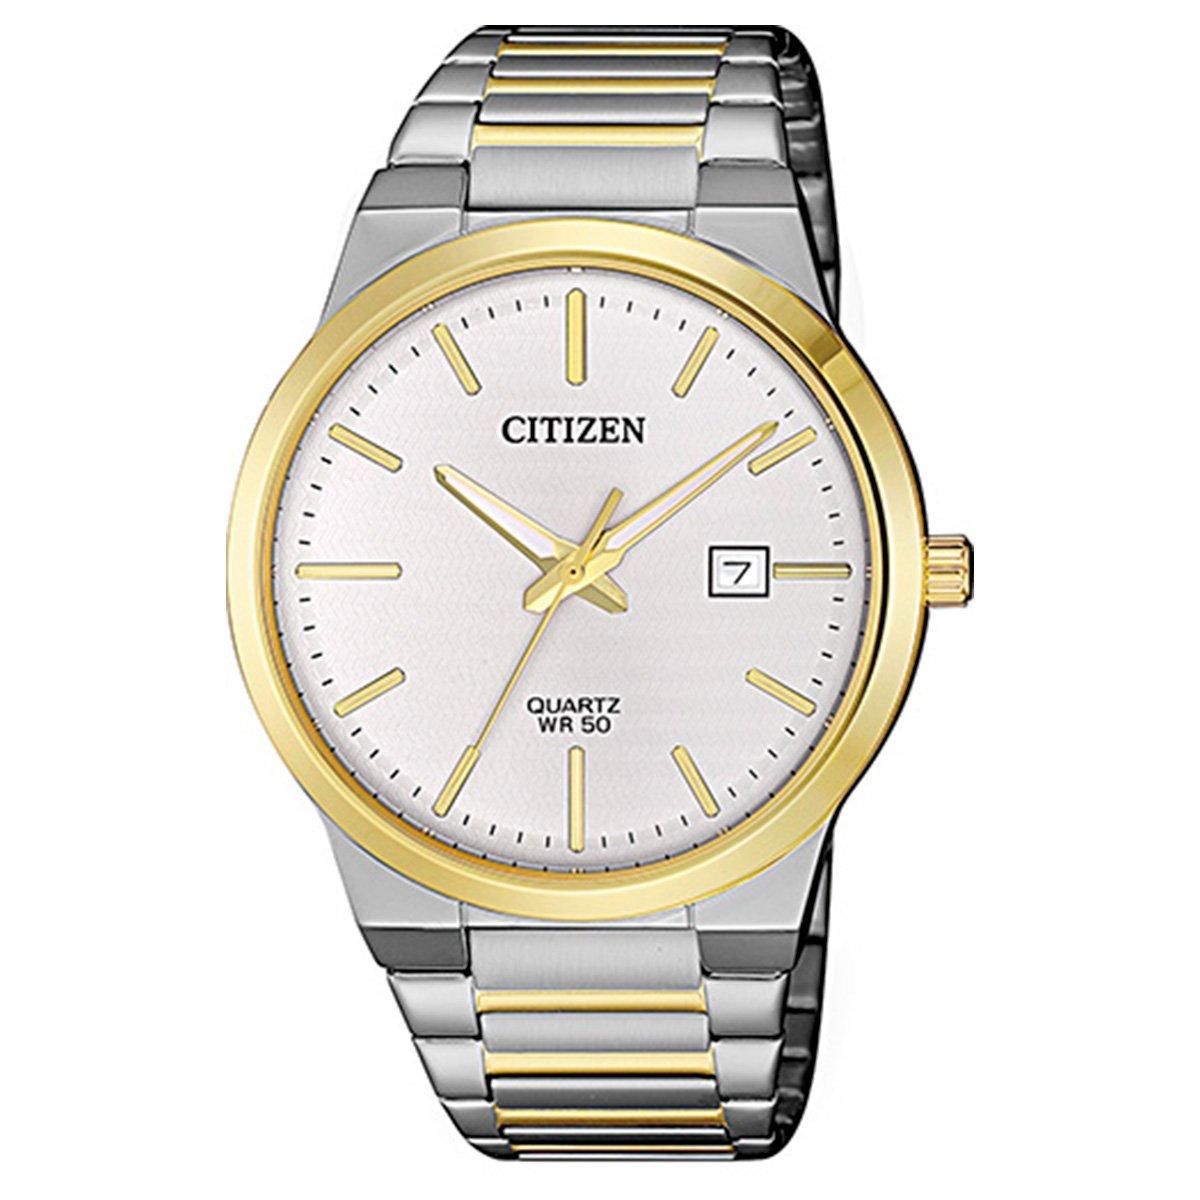 8253e3c8854 Relógio Citizen Analógico TZ20831S Masculino